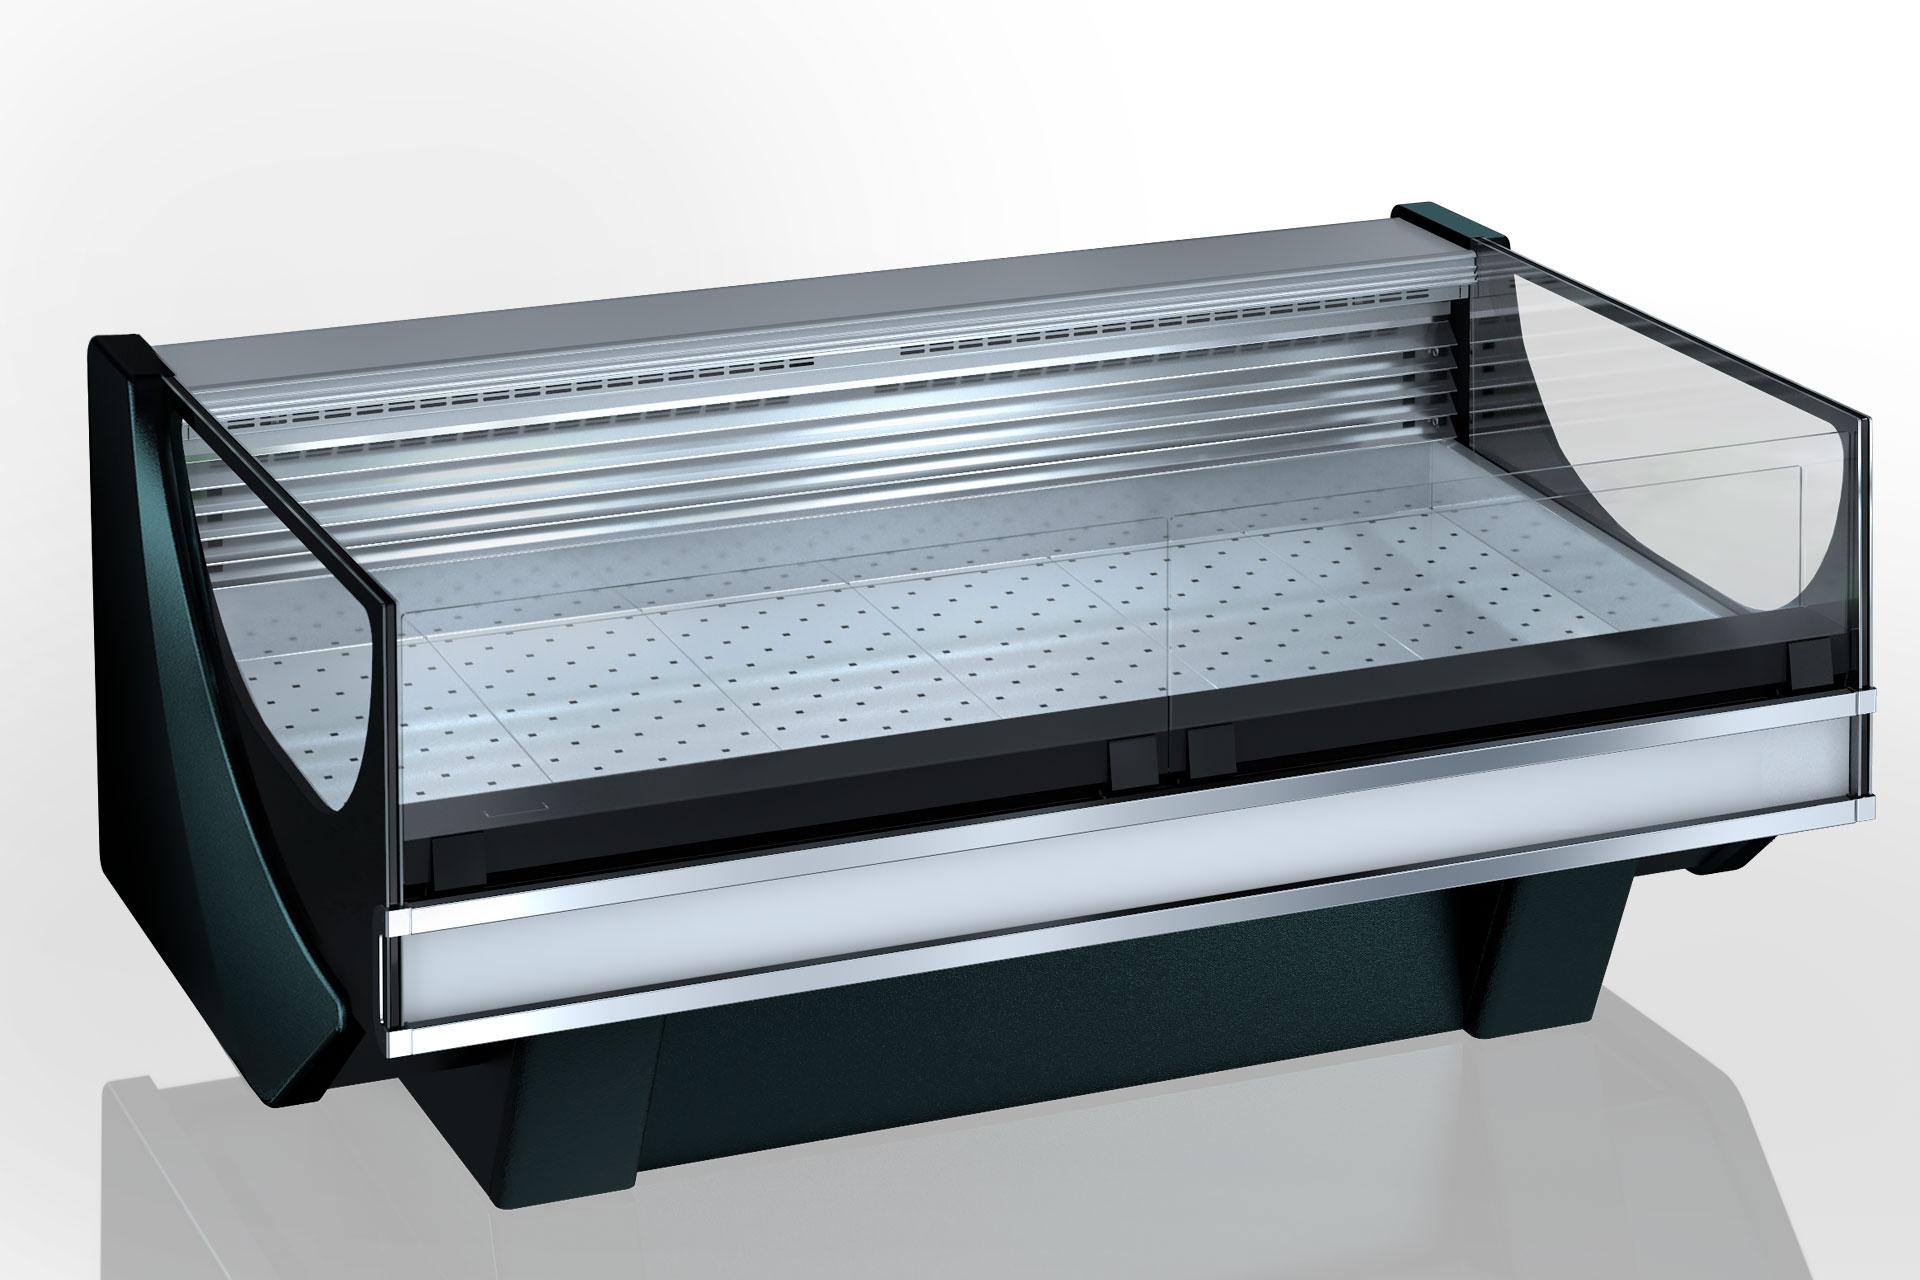 Refrigerated counters Missouri Cold Diamond MC 126 fish self 084-SPLM/SPLA